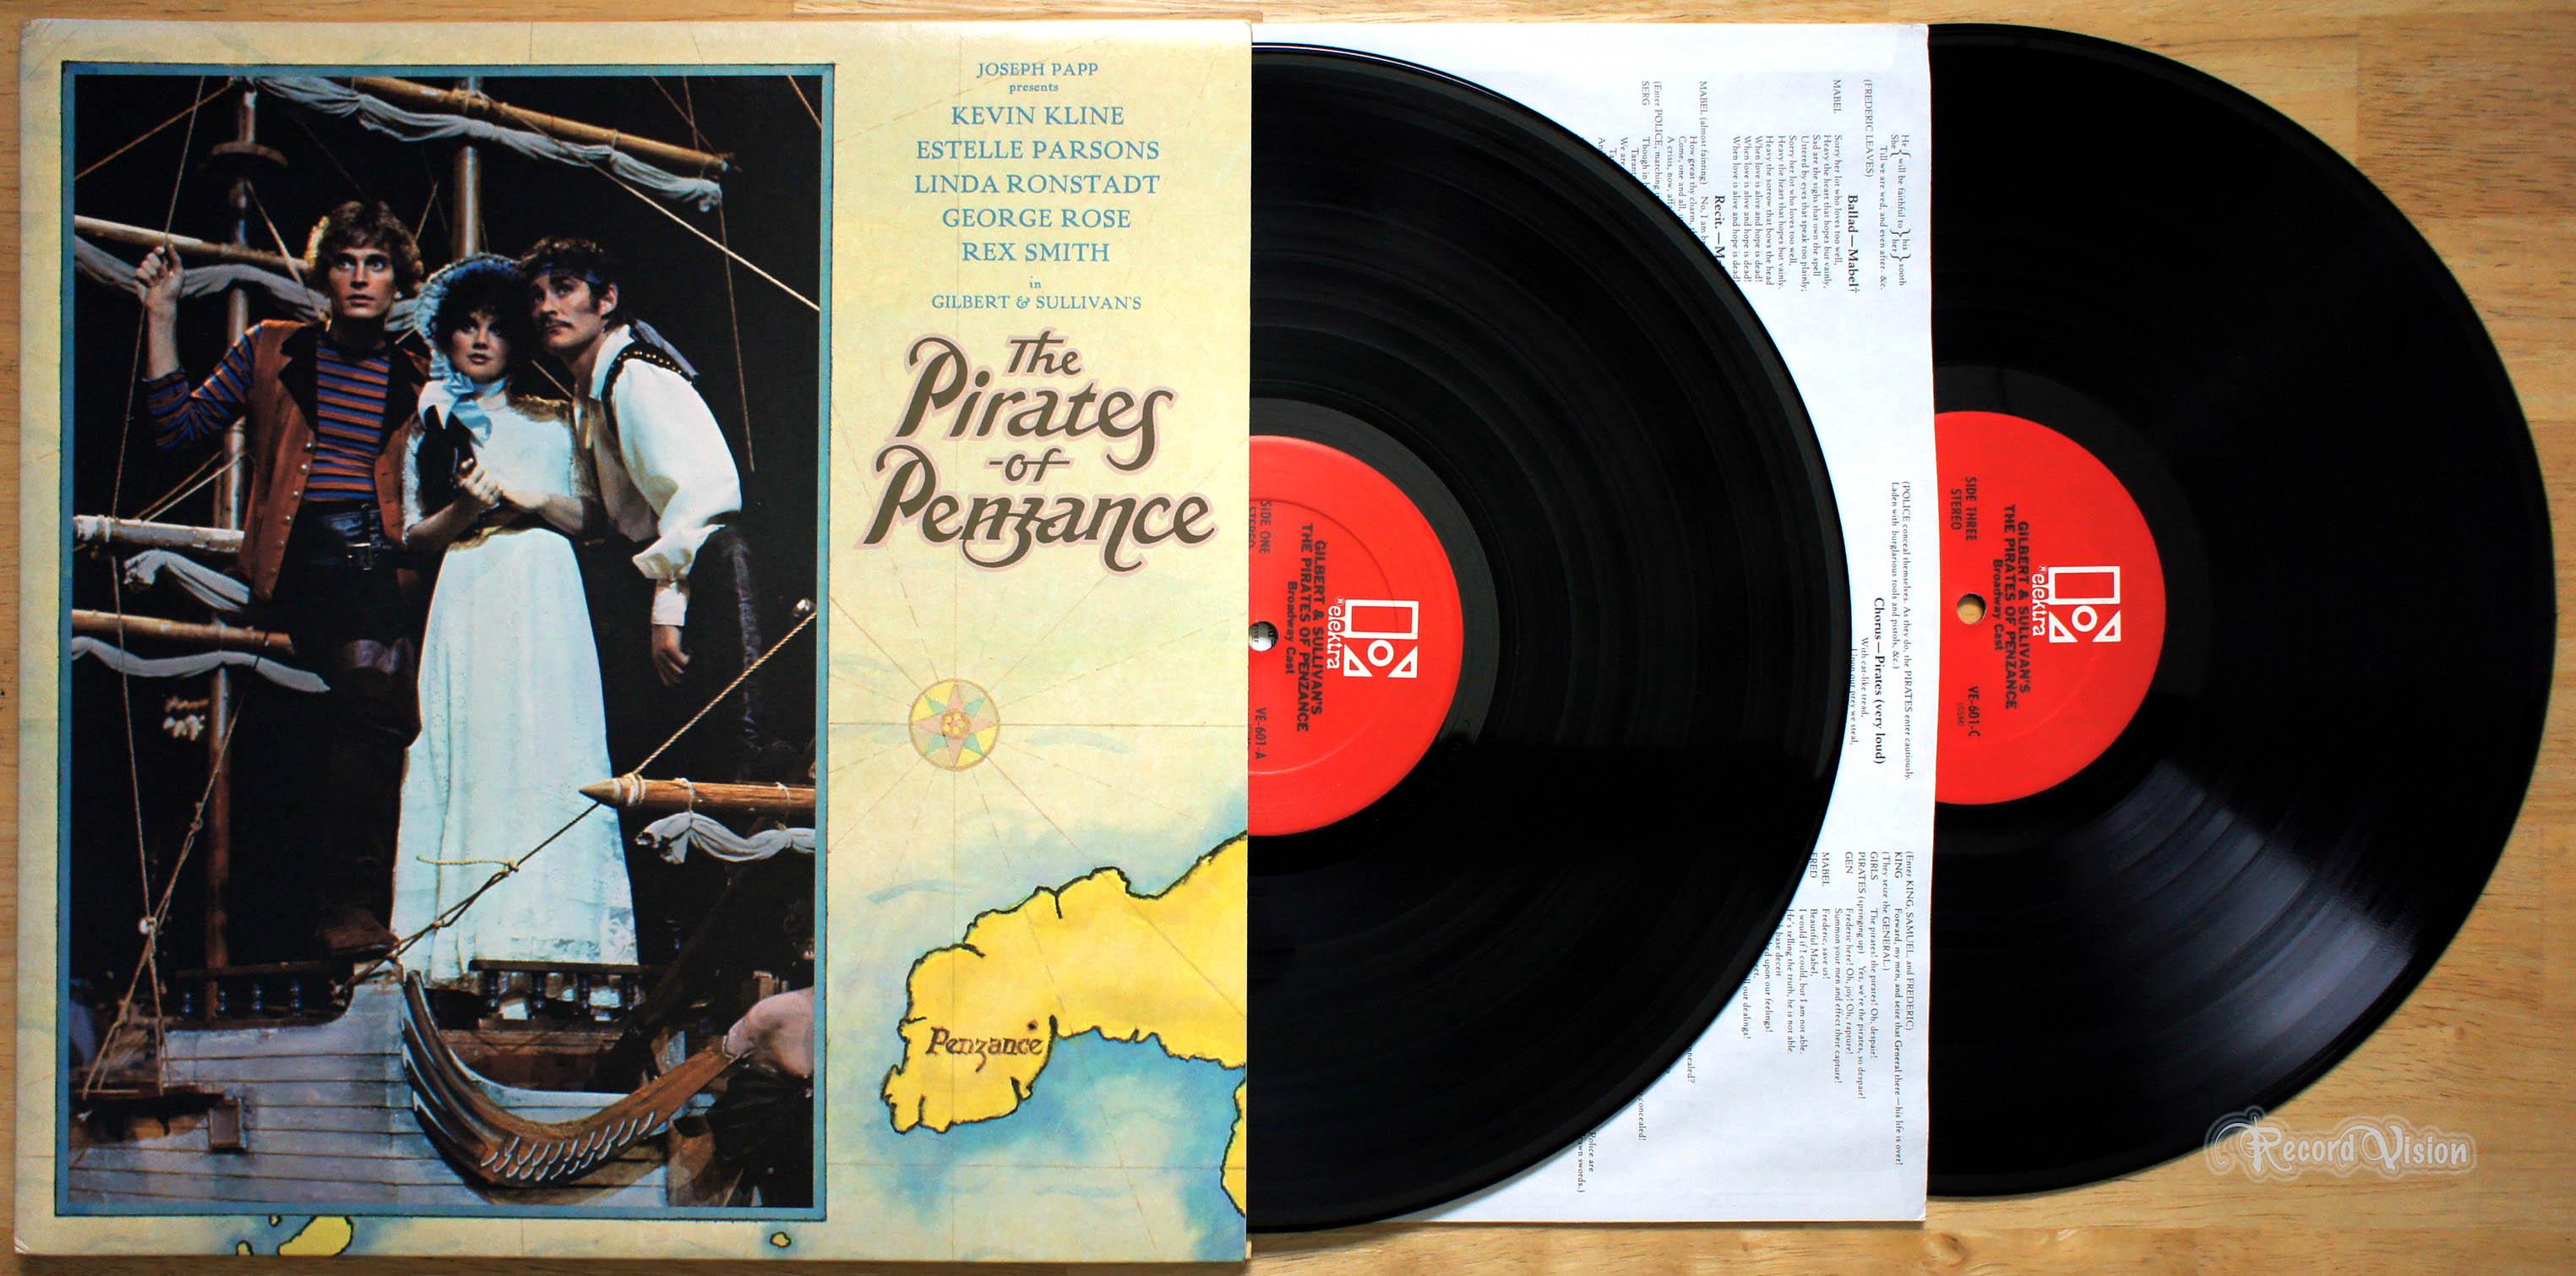 LINDA RONSTADT - The Pirates of Penzance - 33T x 2